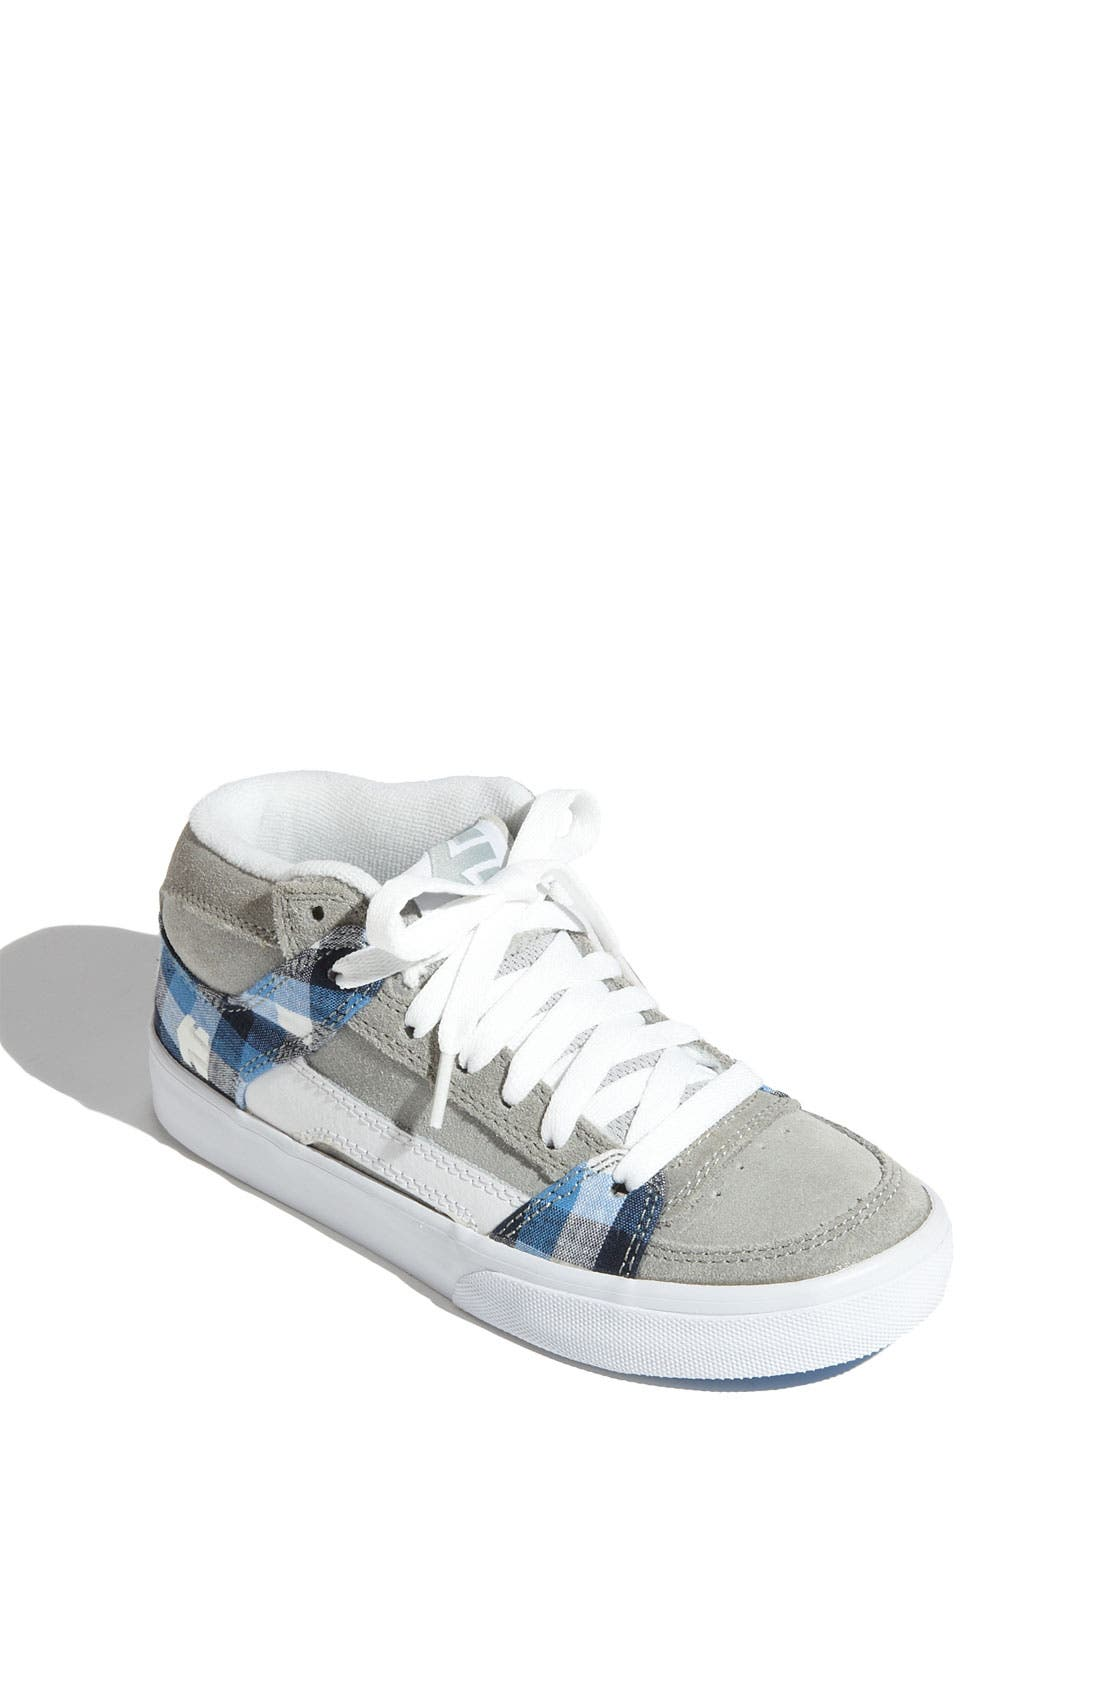 Alternate Image 1 Selected - Etnies 'RVM - Autism Speaks' Skate Shoe (Toddler, Little Kid & Big Kid)